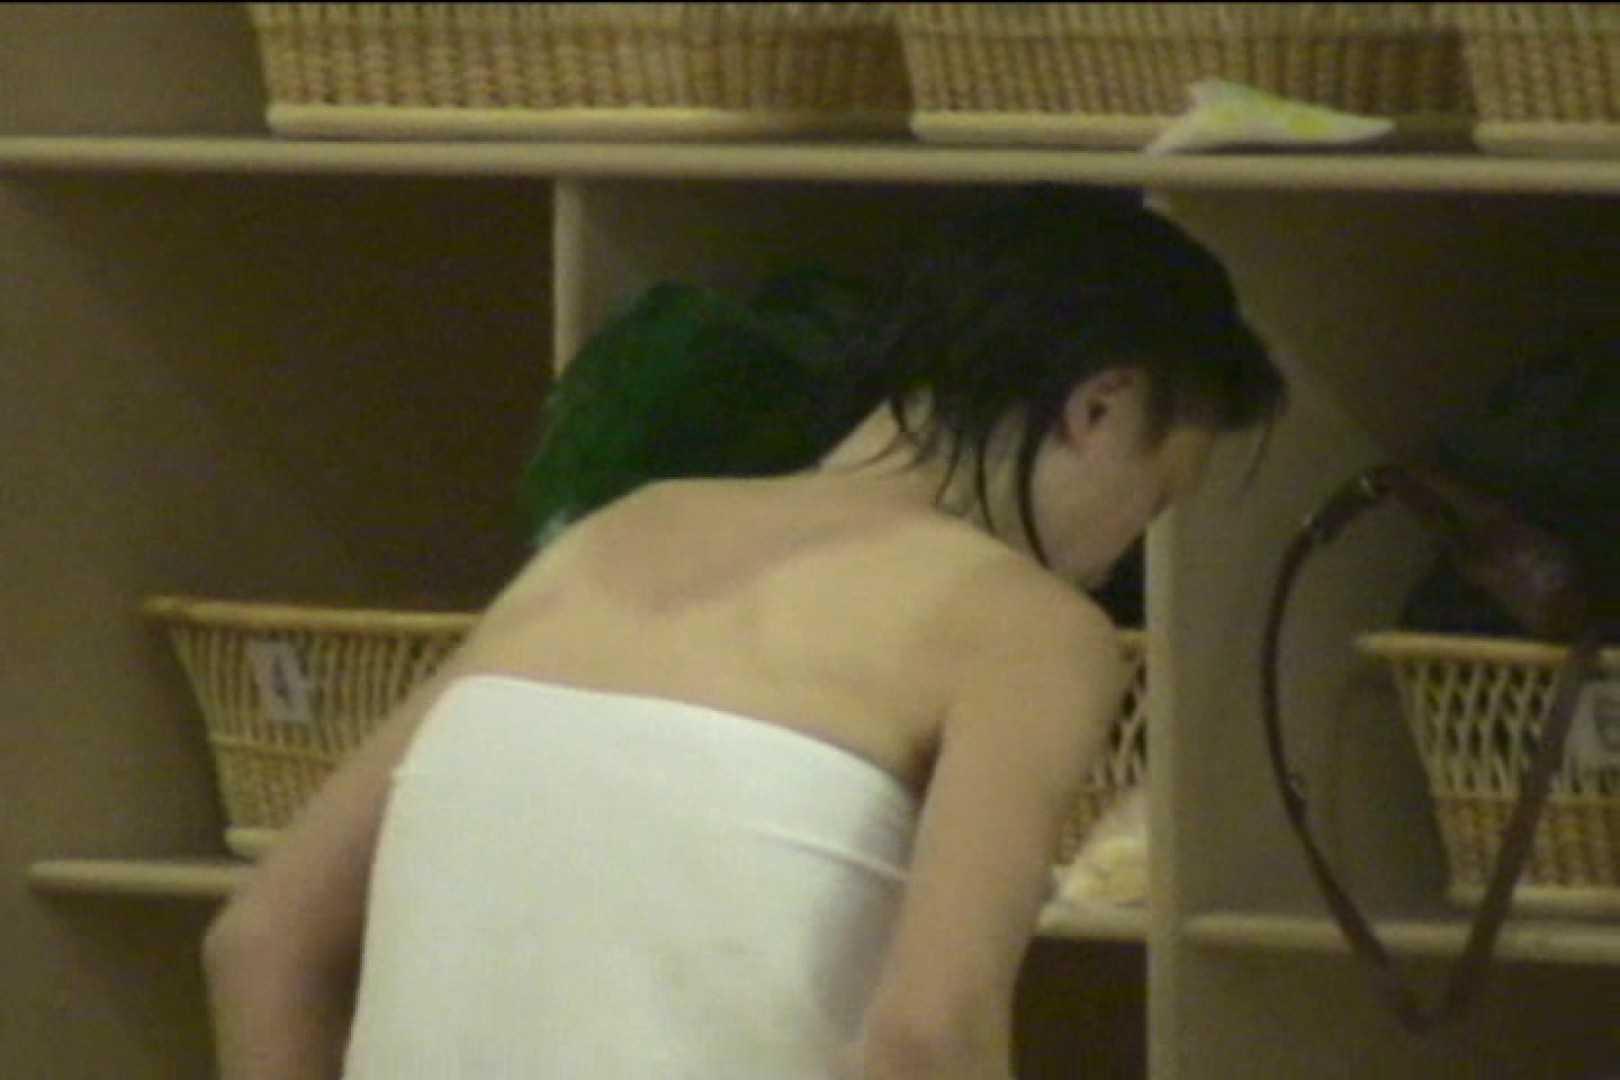 Aquaな露天風呂Vol.454 露天 | HなOL  66pic 40